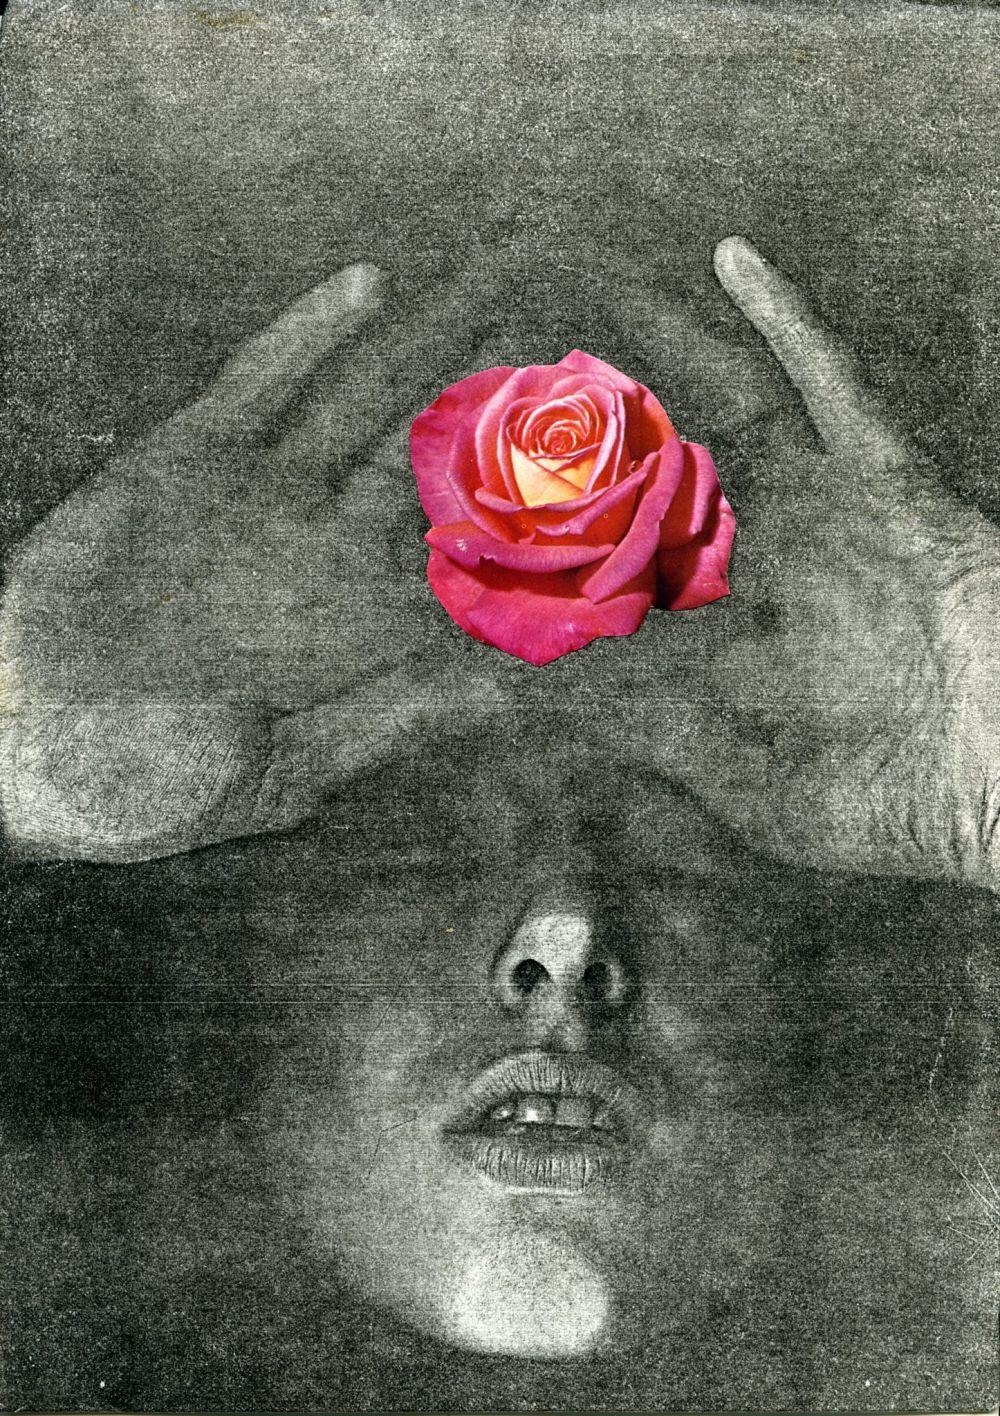 Penny SLINGER, La Vie en Rose, 1976. Xerox self body print with collage 29.8 x 21 cm. Copyright the Artist; Courtesy Richard Saltoun Gallery